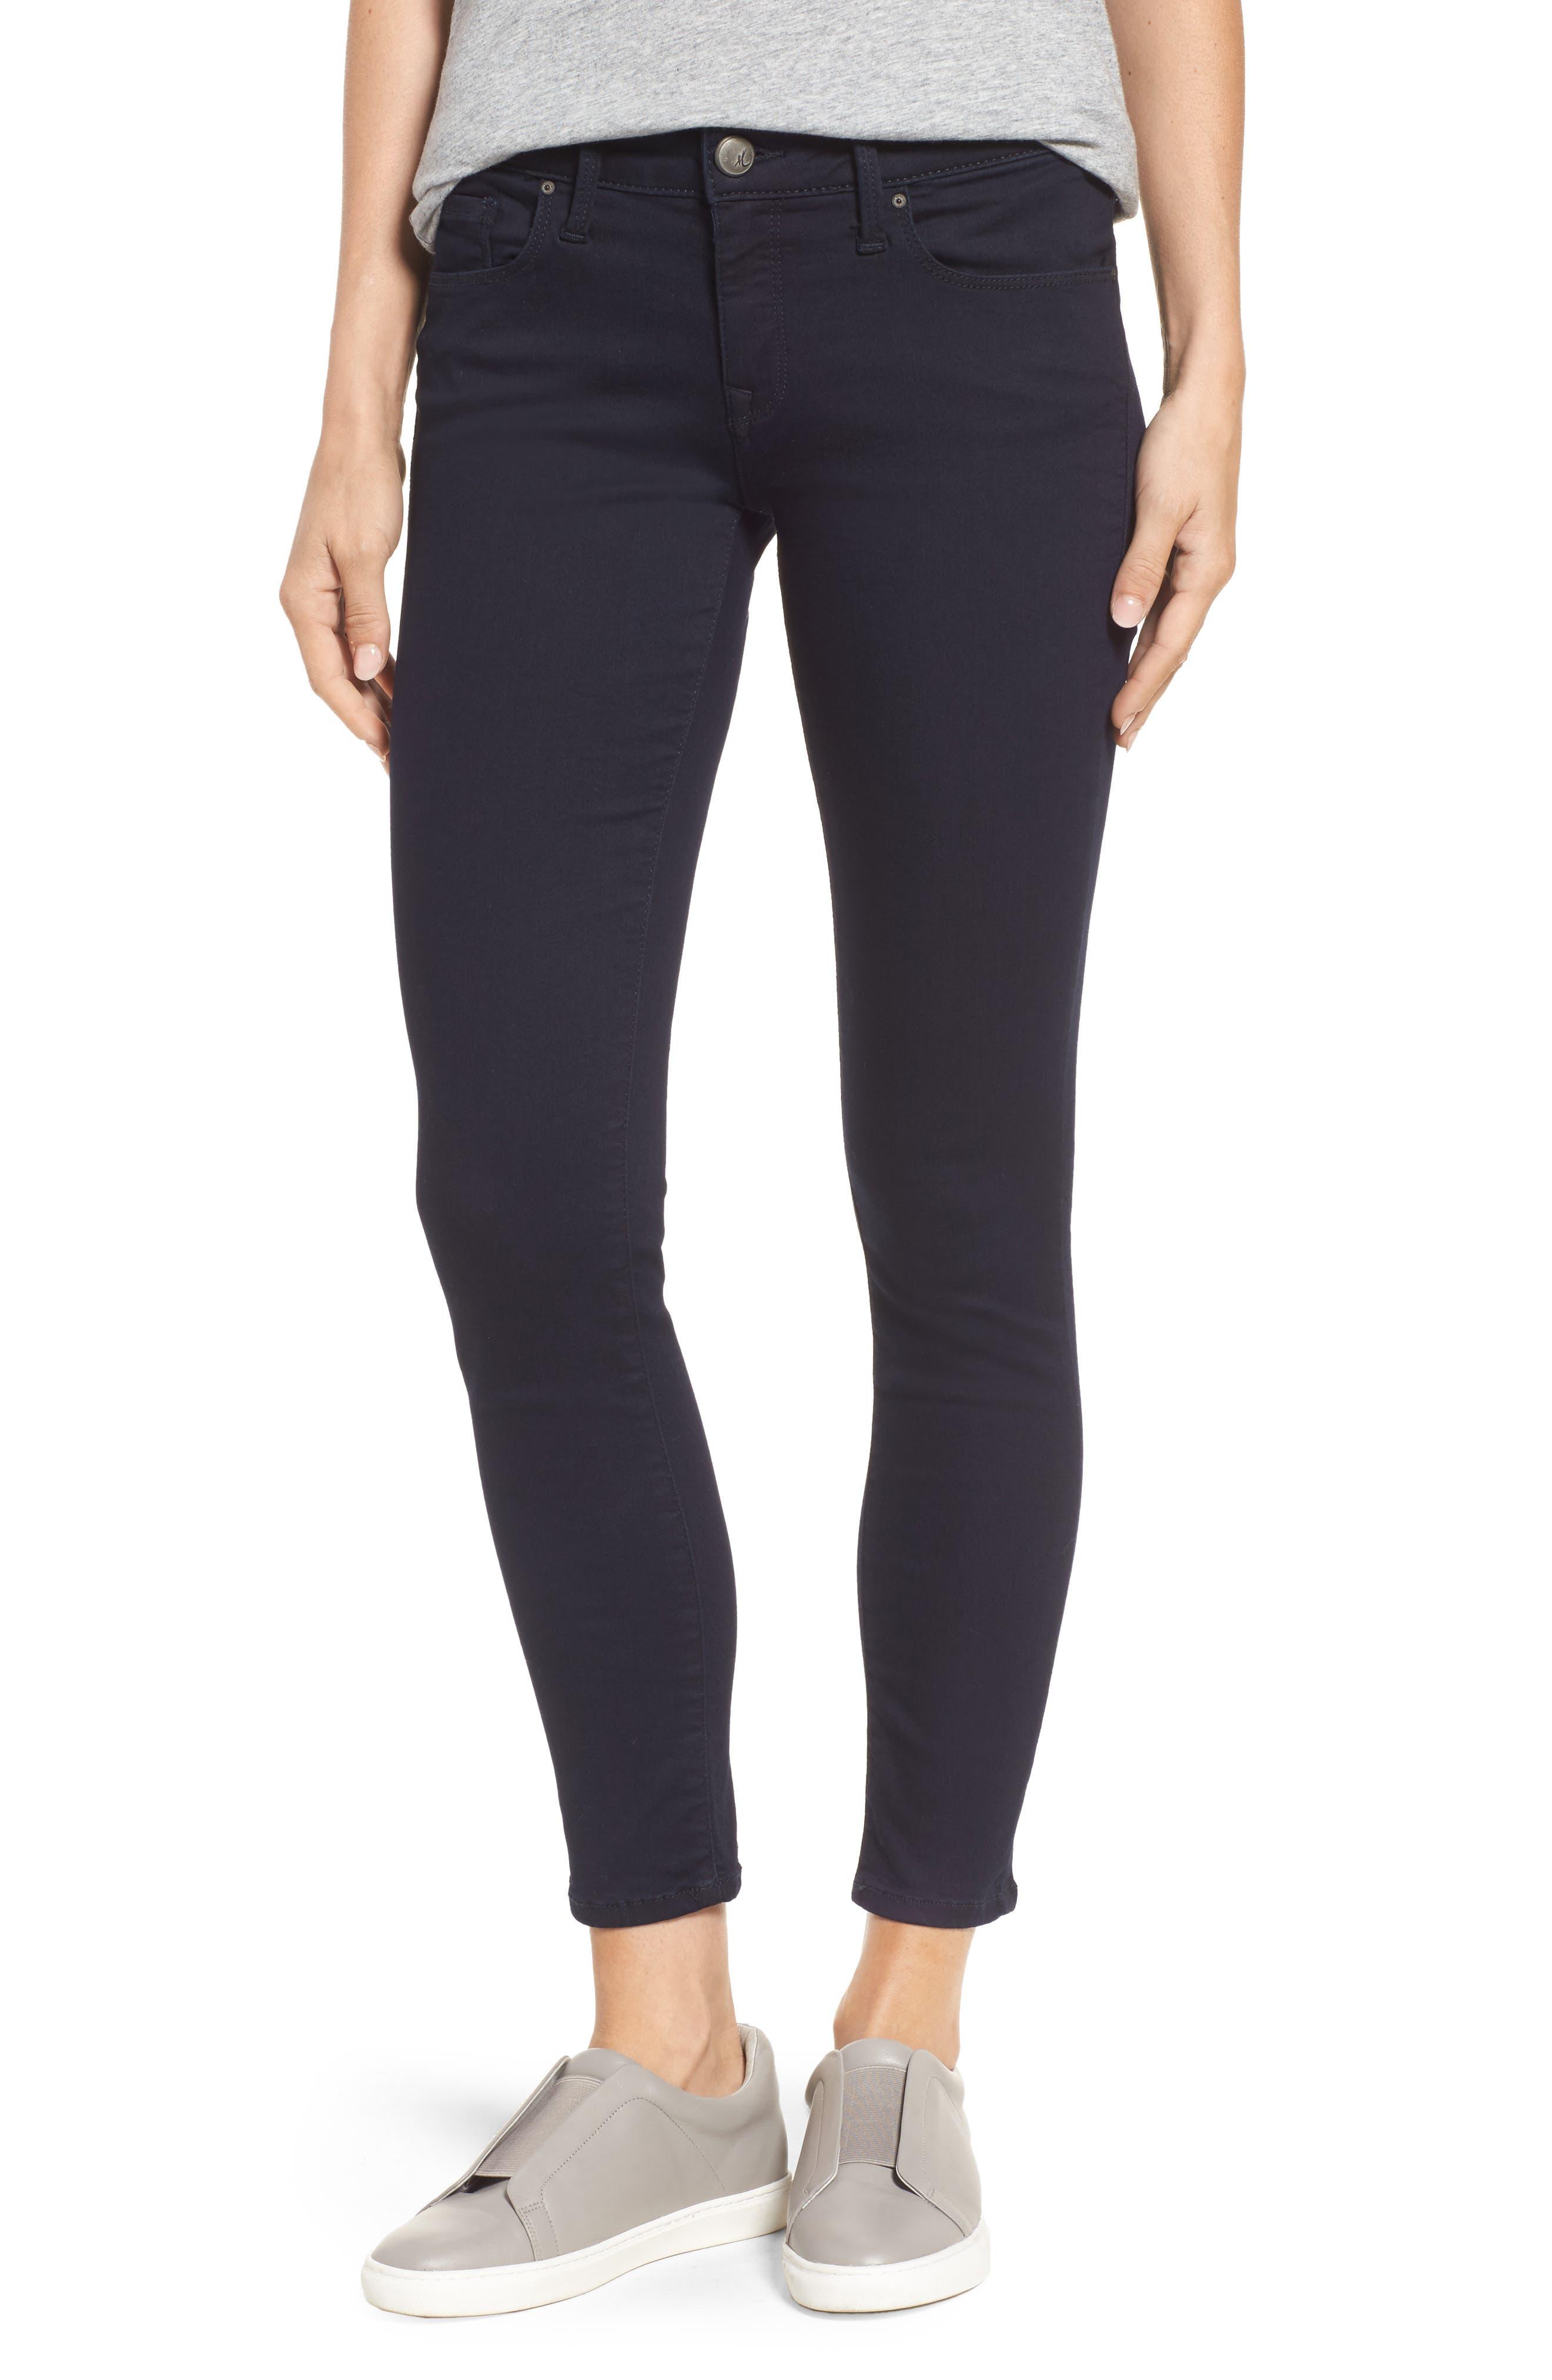 'Alexa' Midrise Skinny Jeans,                             Main thumbnail 1, color,                             401